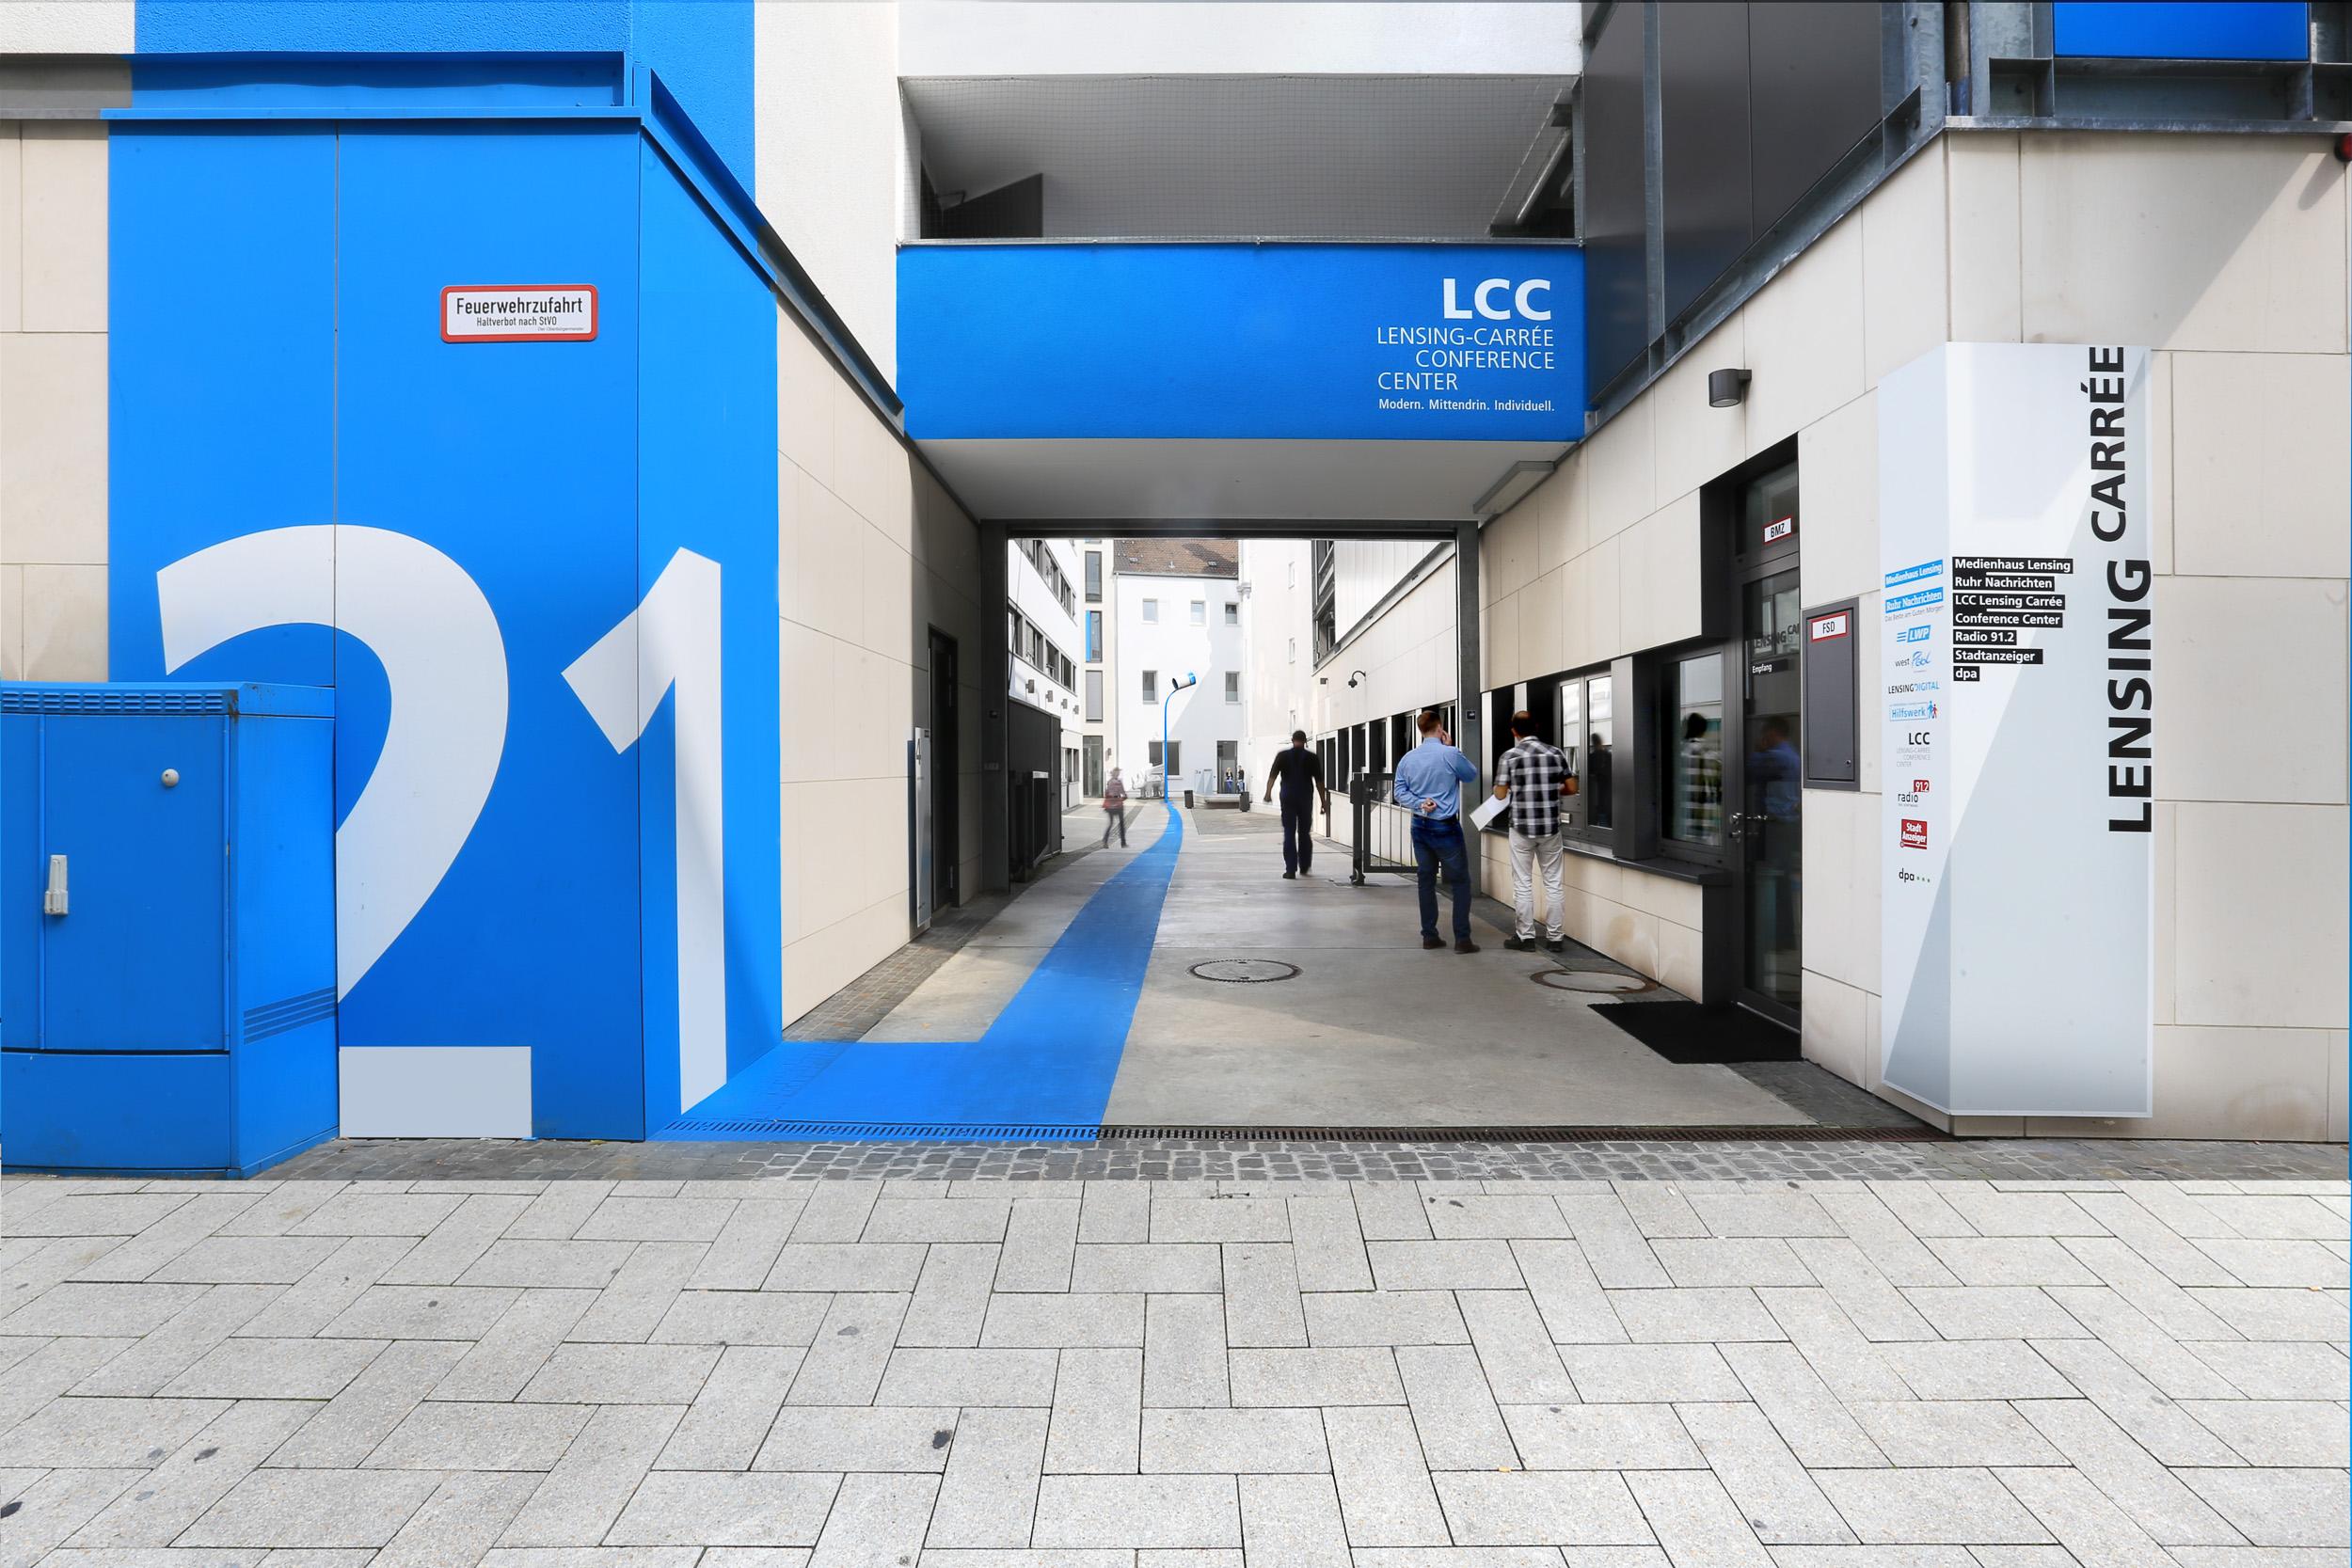 wegeleitsystem-hausnummer-lensing-carree-dortmund-einkaufsstraße.jpg